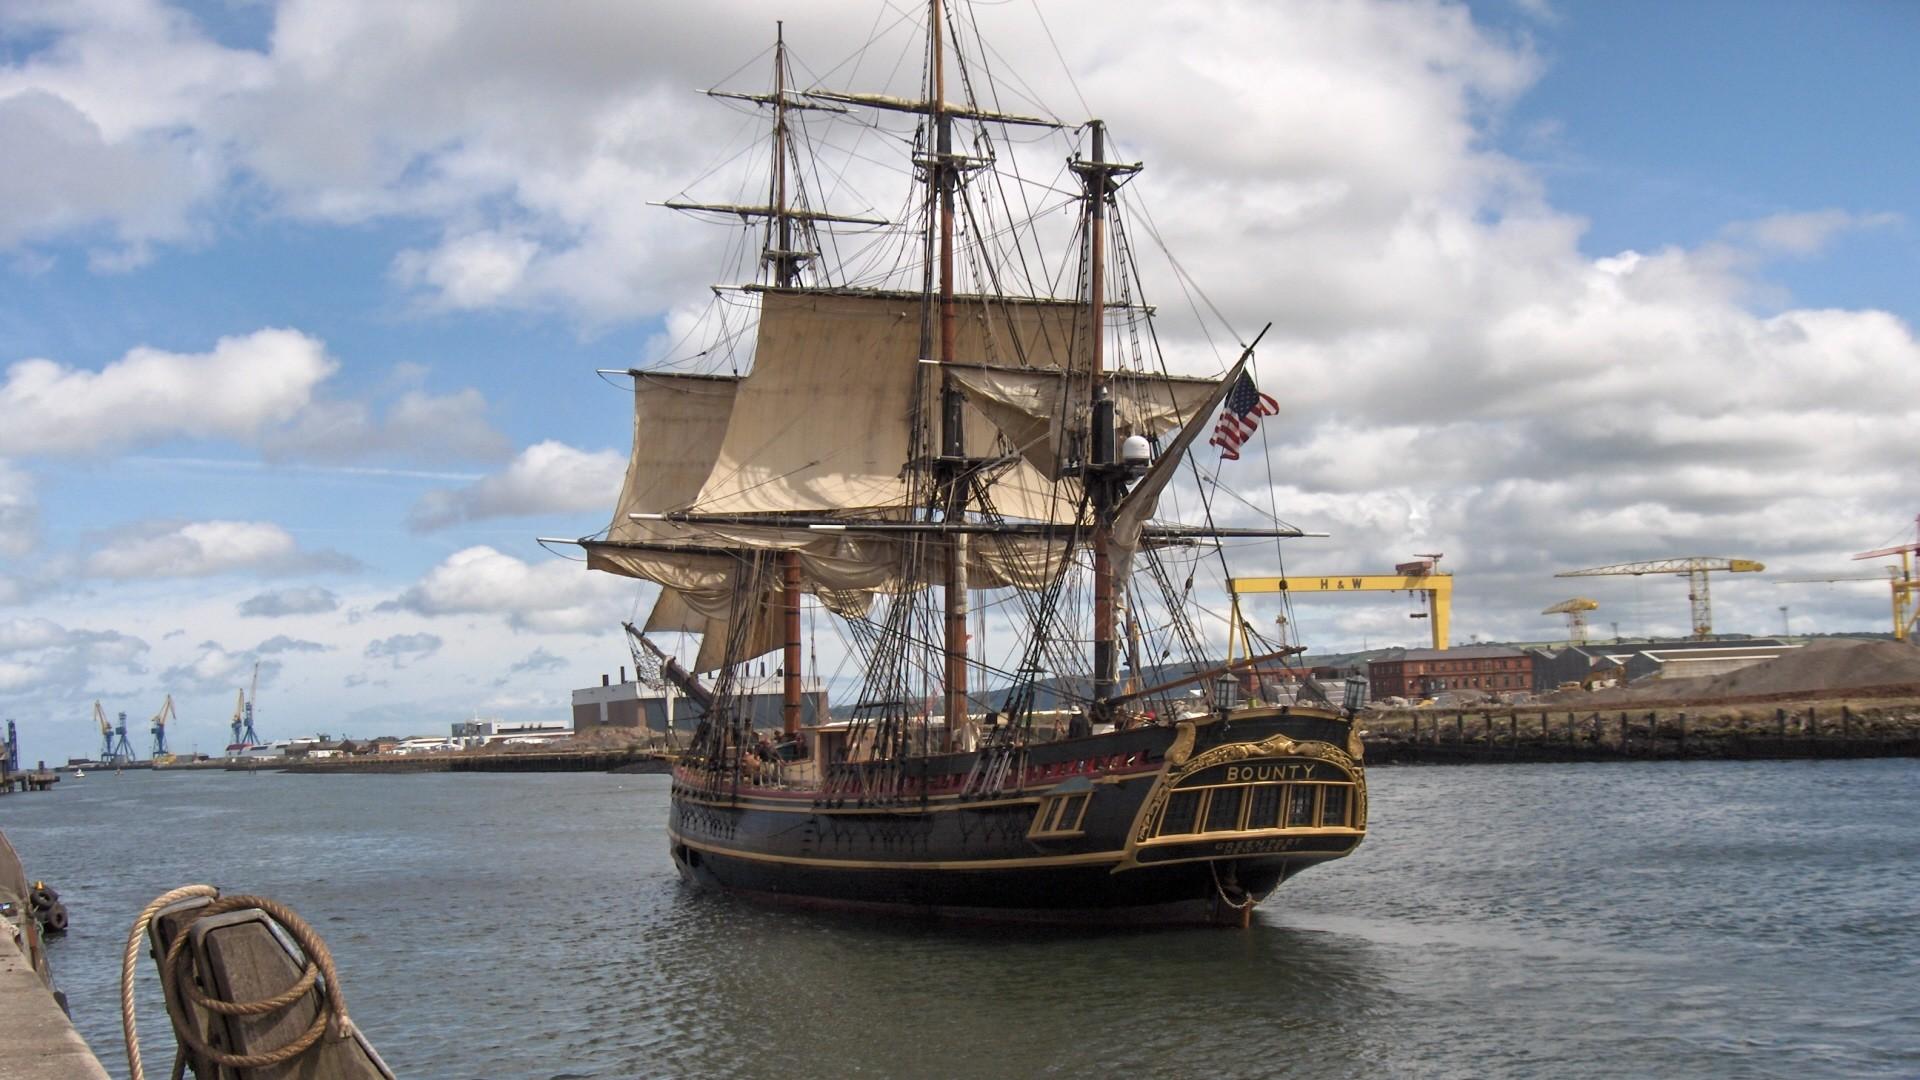 Pirate Ship Wallpaper Pirate, Ship